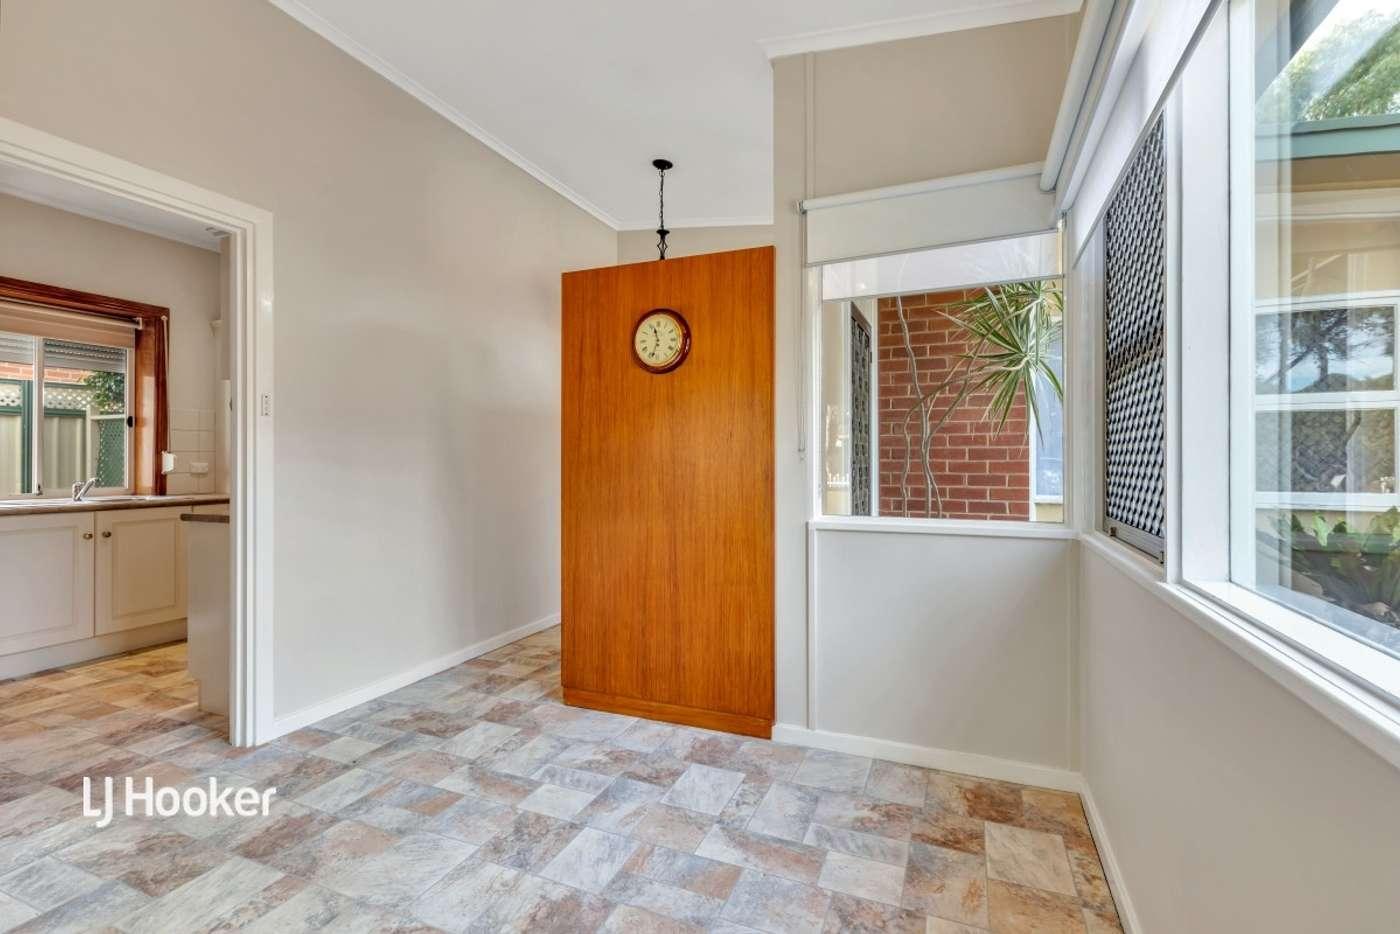 Sixth view of Homely house listing, 277 Waterloo Corner Road, Salisbury North SA 5108